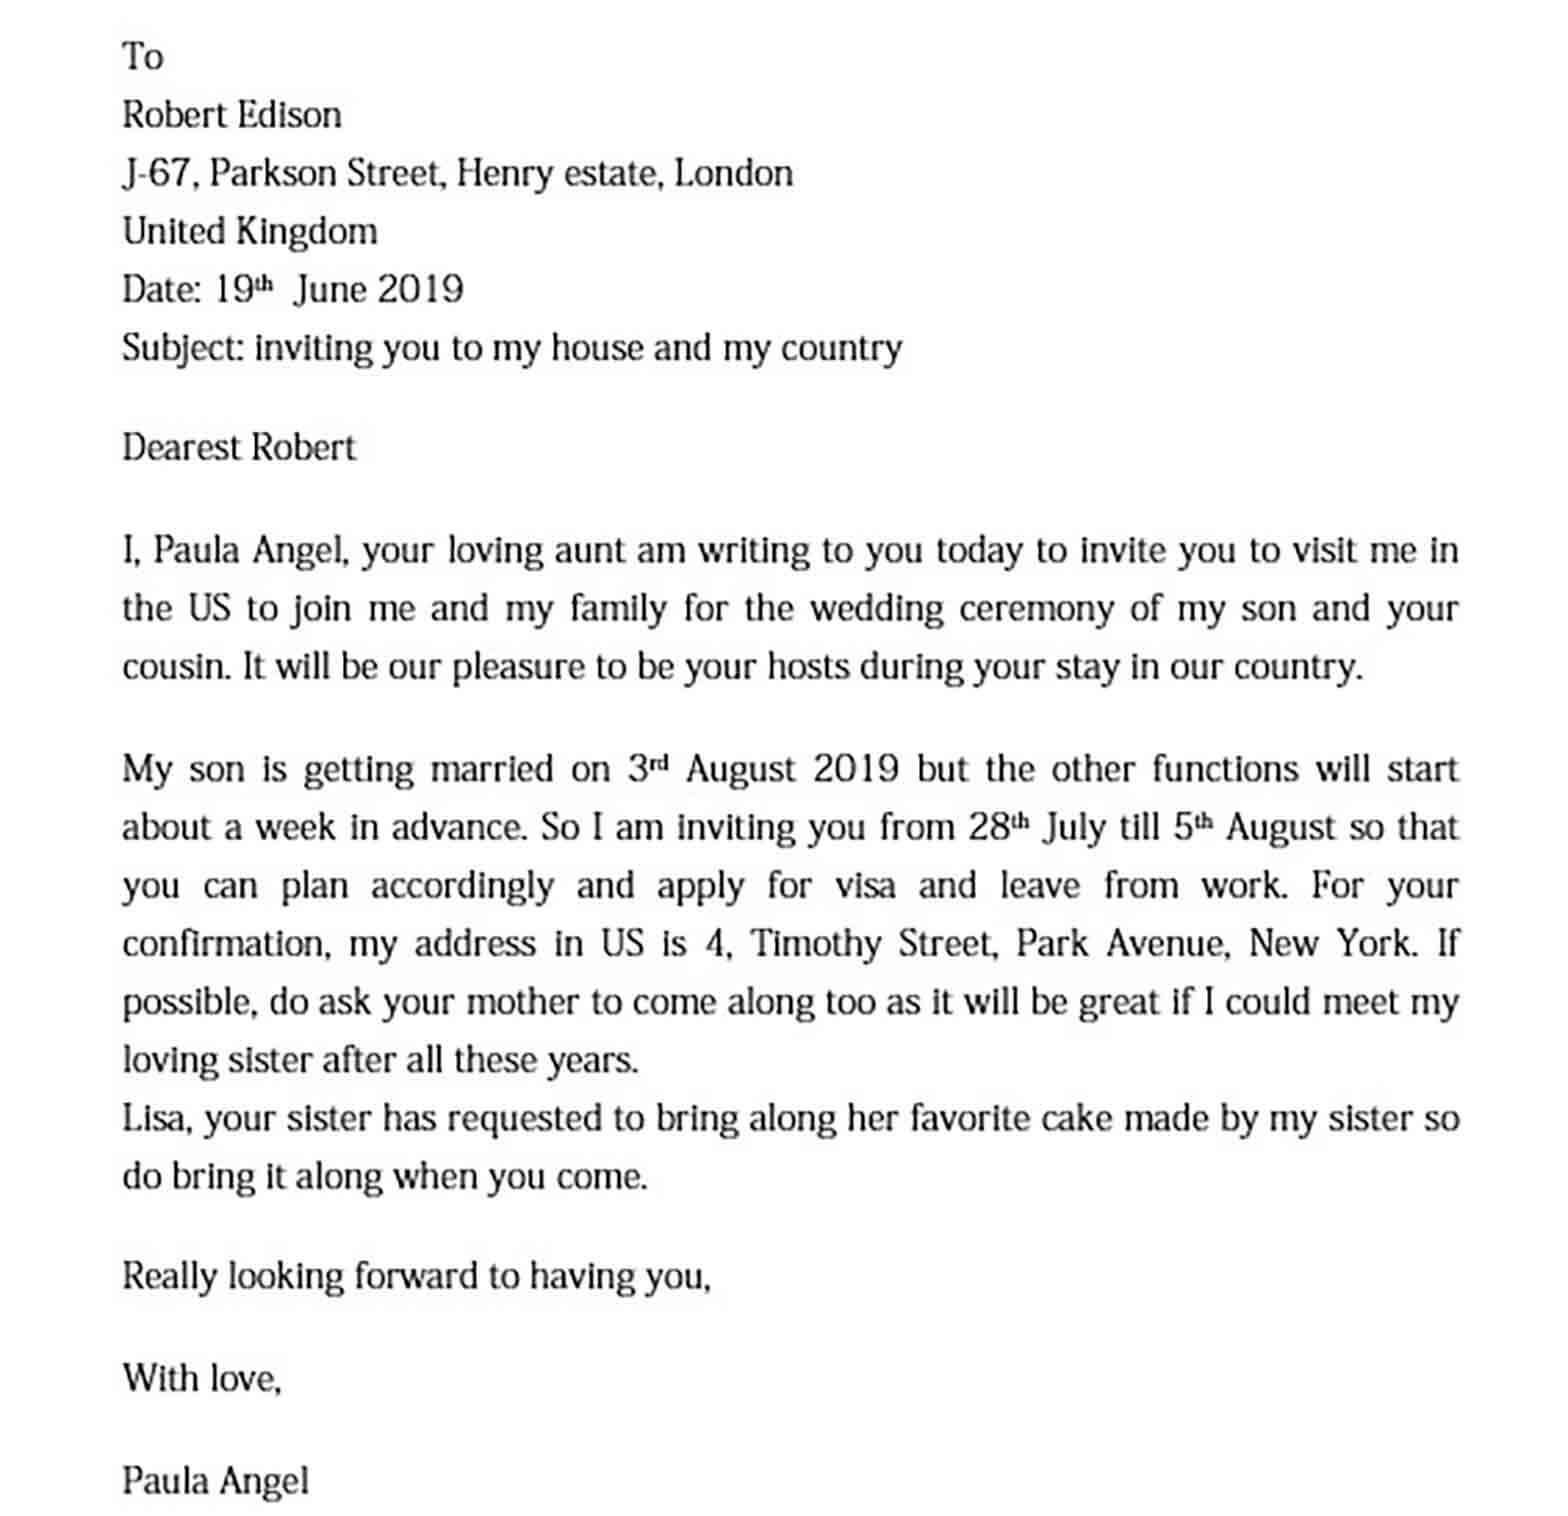 Sample Invitation Letter for US Visa